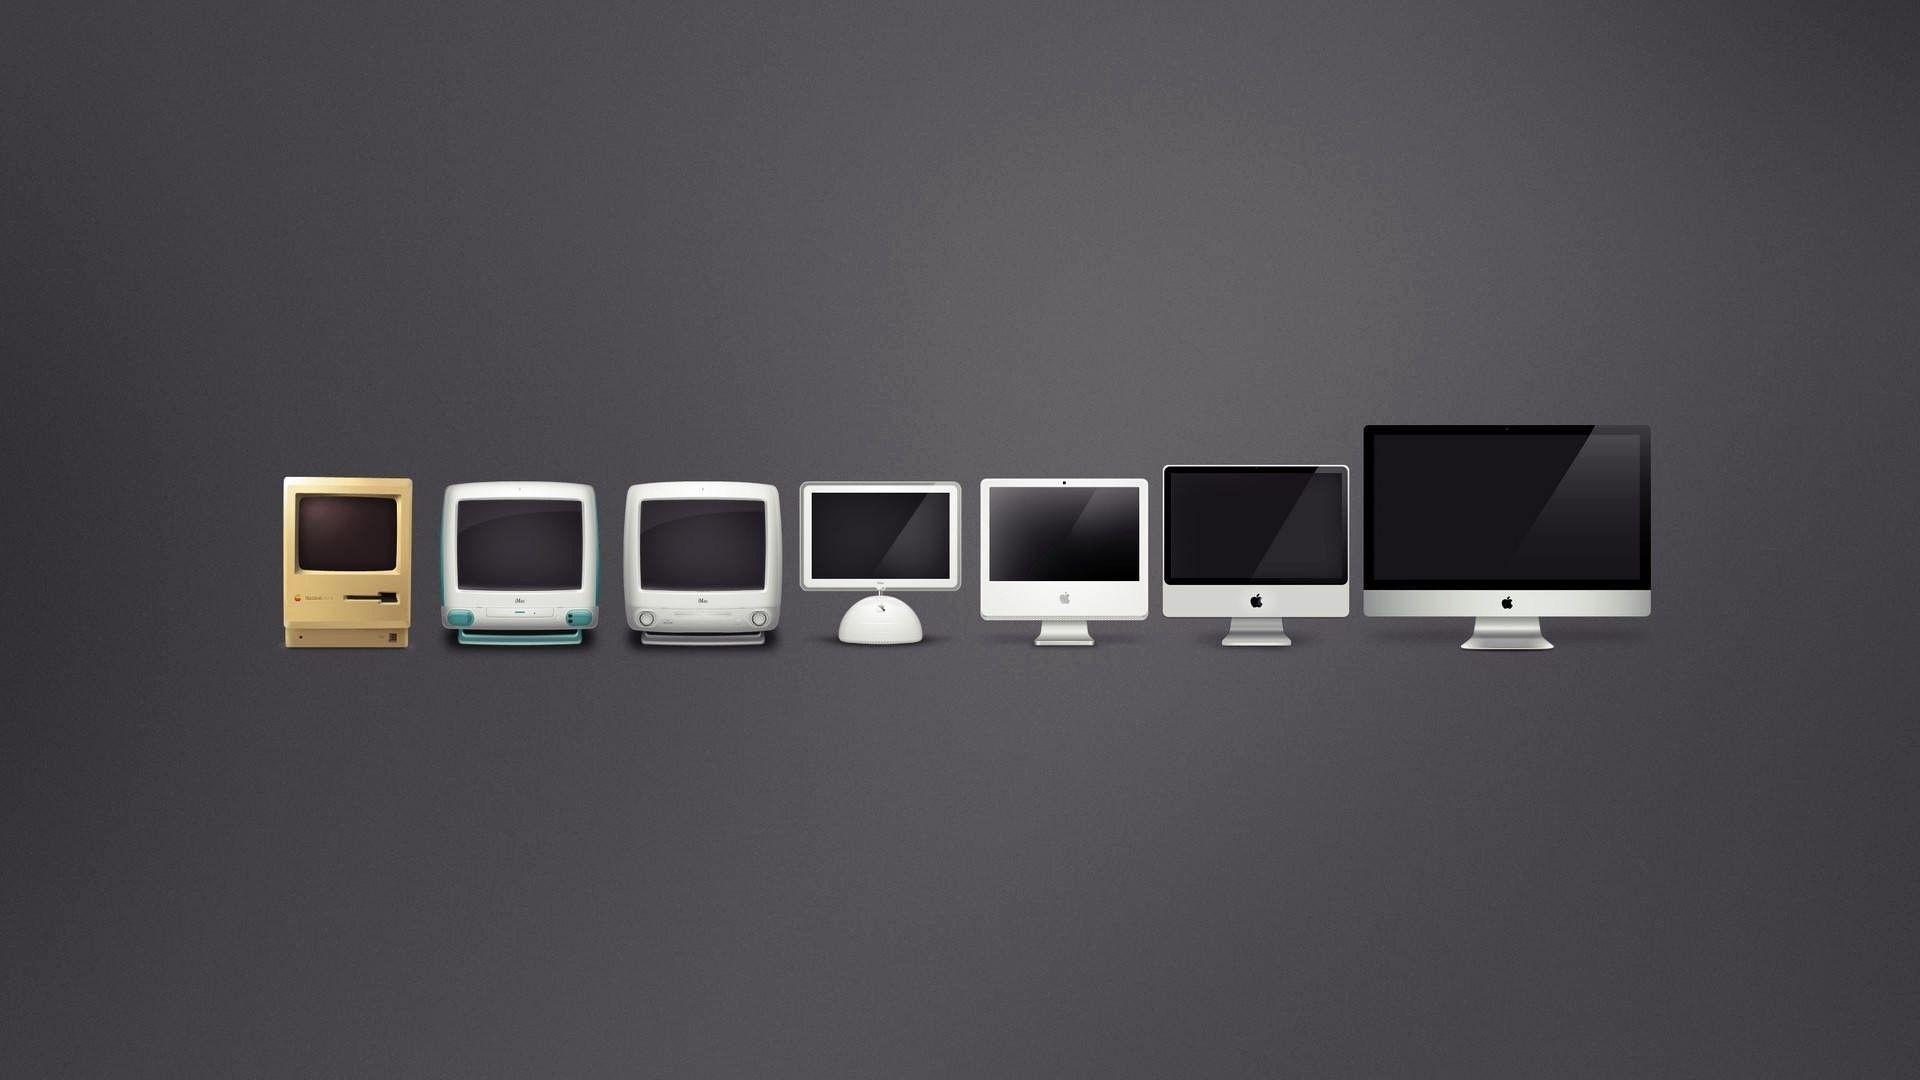 Full HD 1080p Mac Wallpapers HD, Desktop Backgrounds 1920x1080